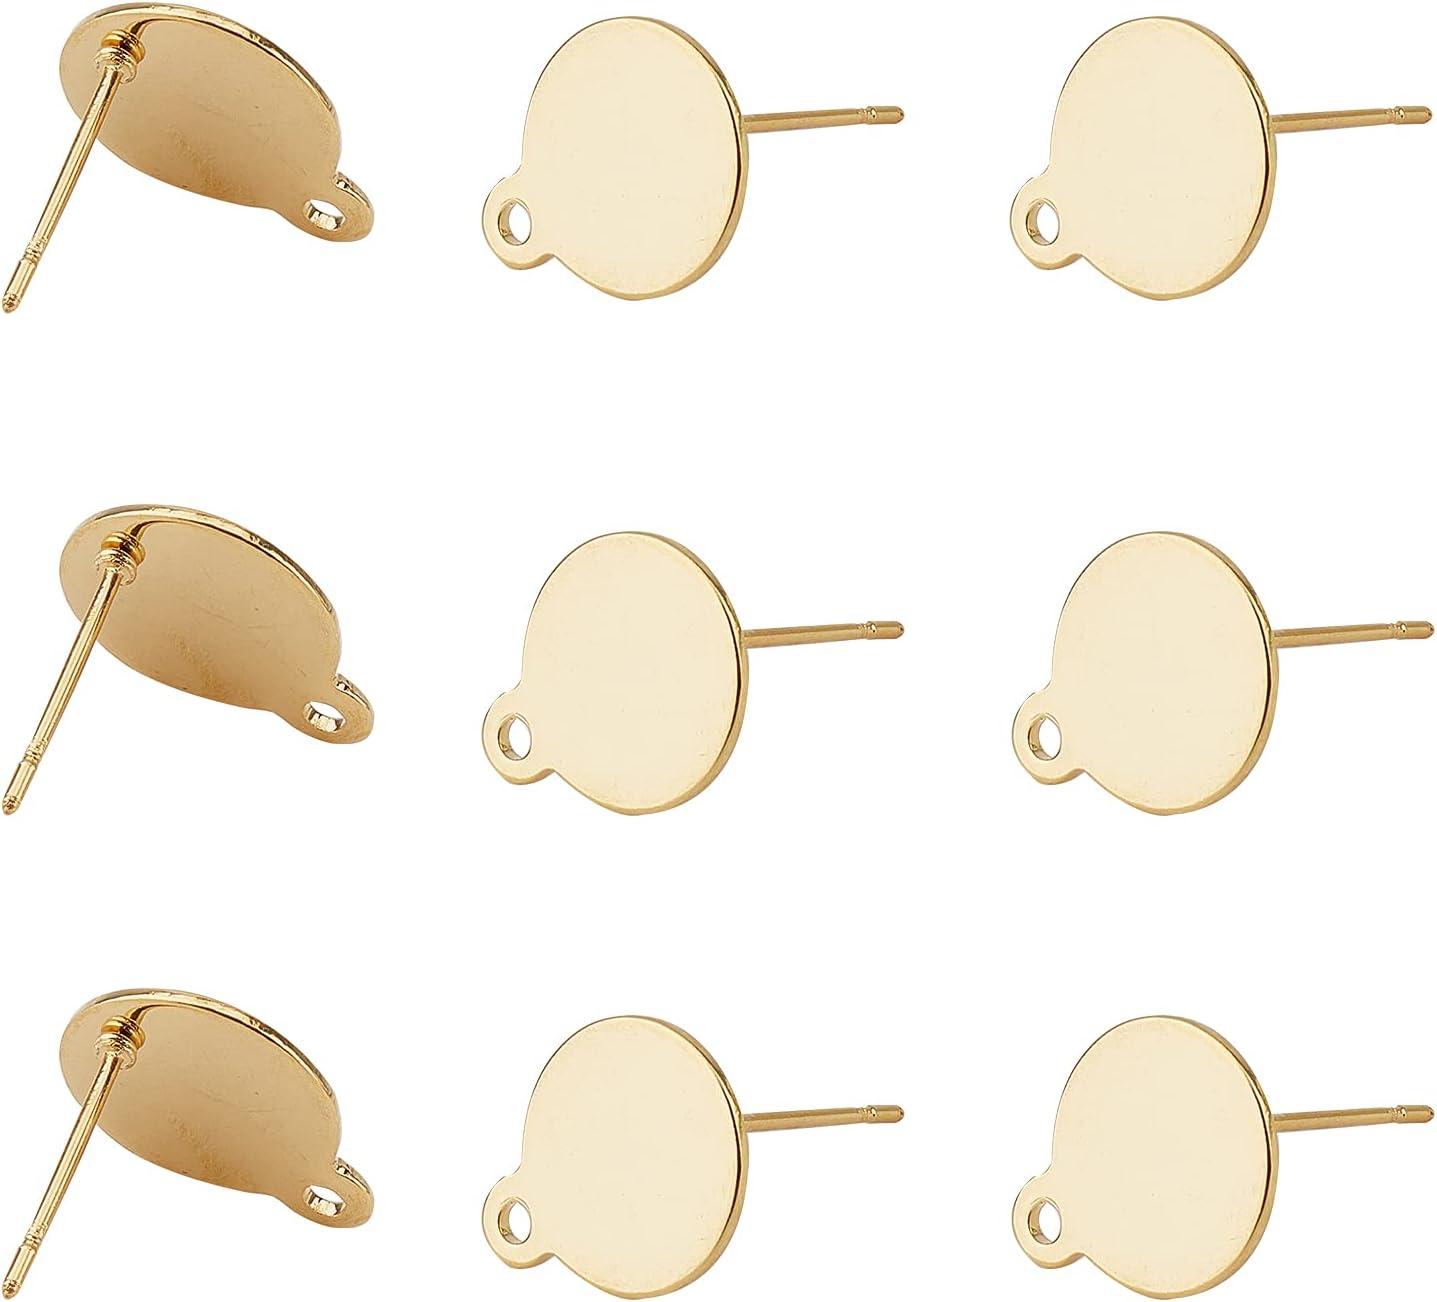 leaf stud 2 PCS making jewelry charm pendant Rubber Coated 5 Leaves 1 hole earring post 1 PAIR EM0161E-BE -  21 x 20 mm Dark Beige